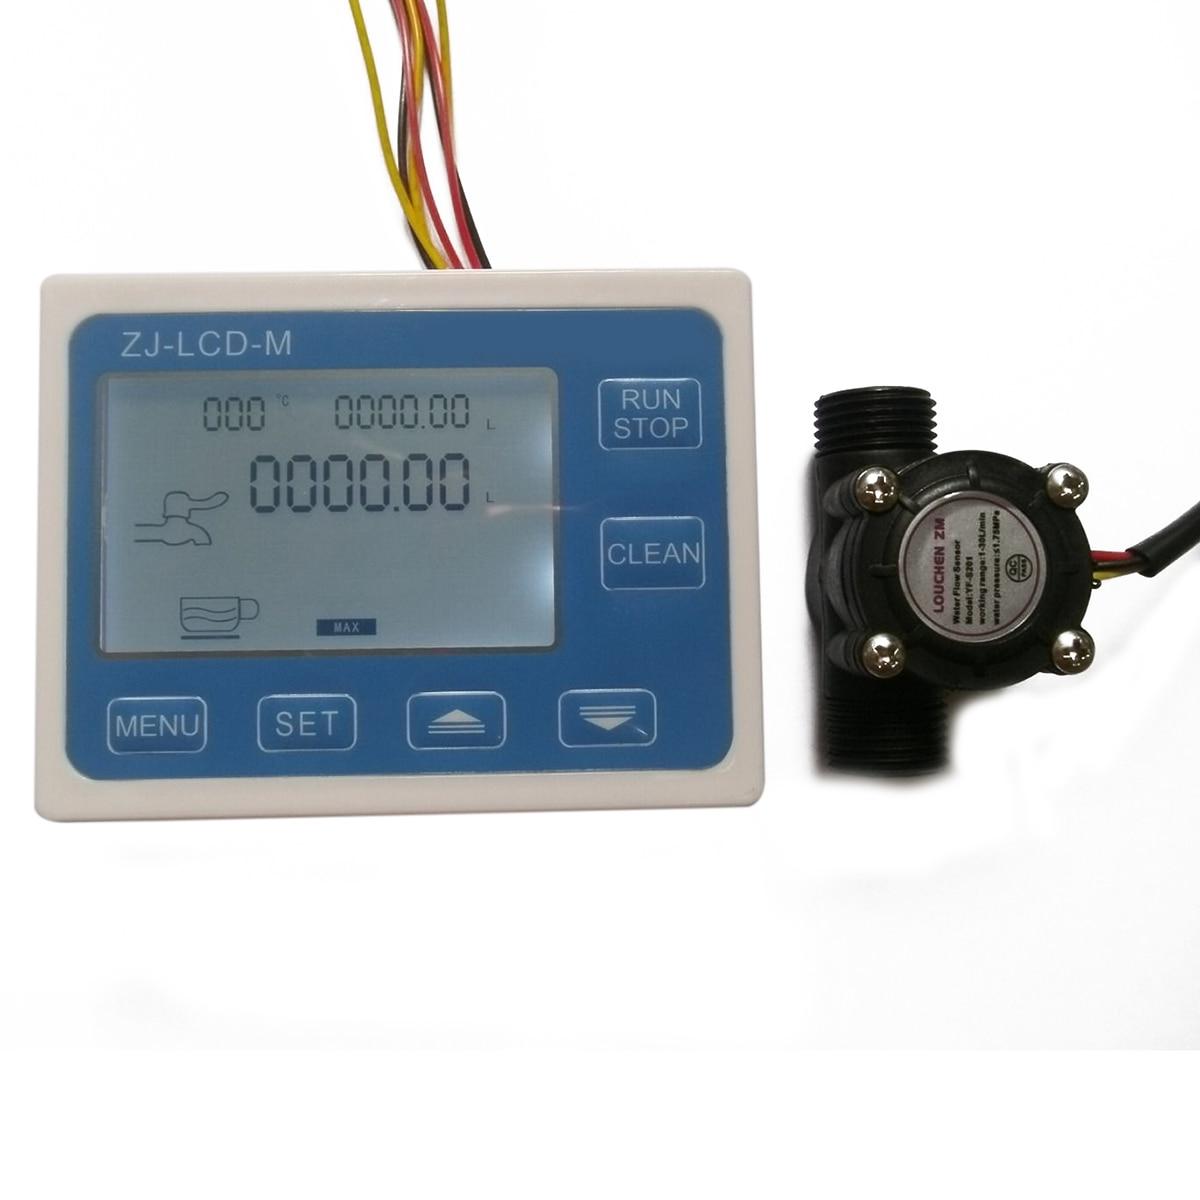 G1/2 Hall effect Flow Water Sensor Meter Mayitr Flowmeter + Blue Digital LCD Display Controller For Solenoid Valve<br>